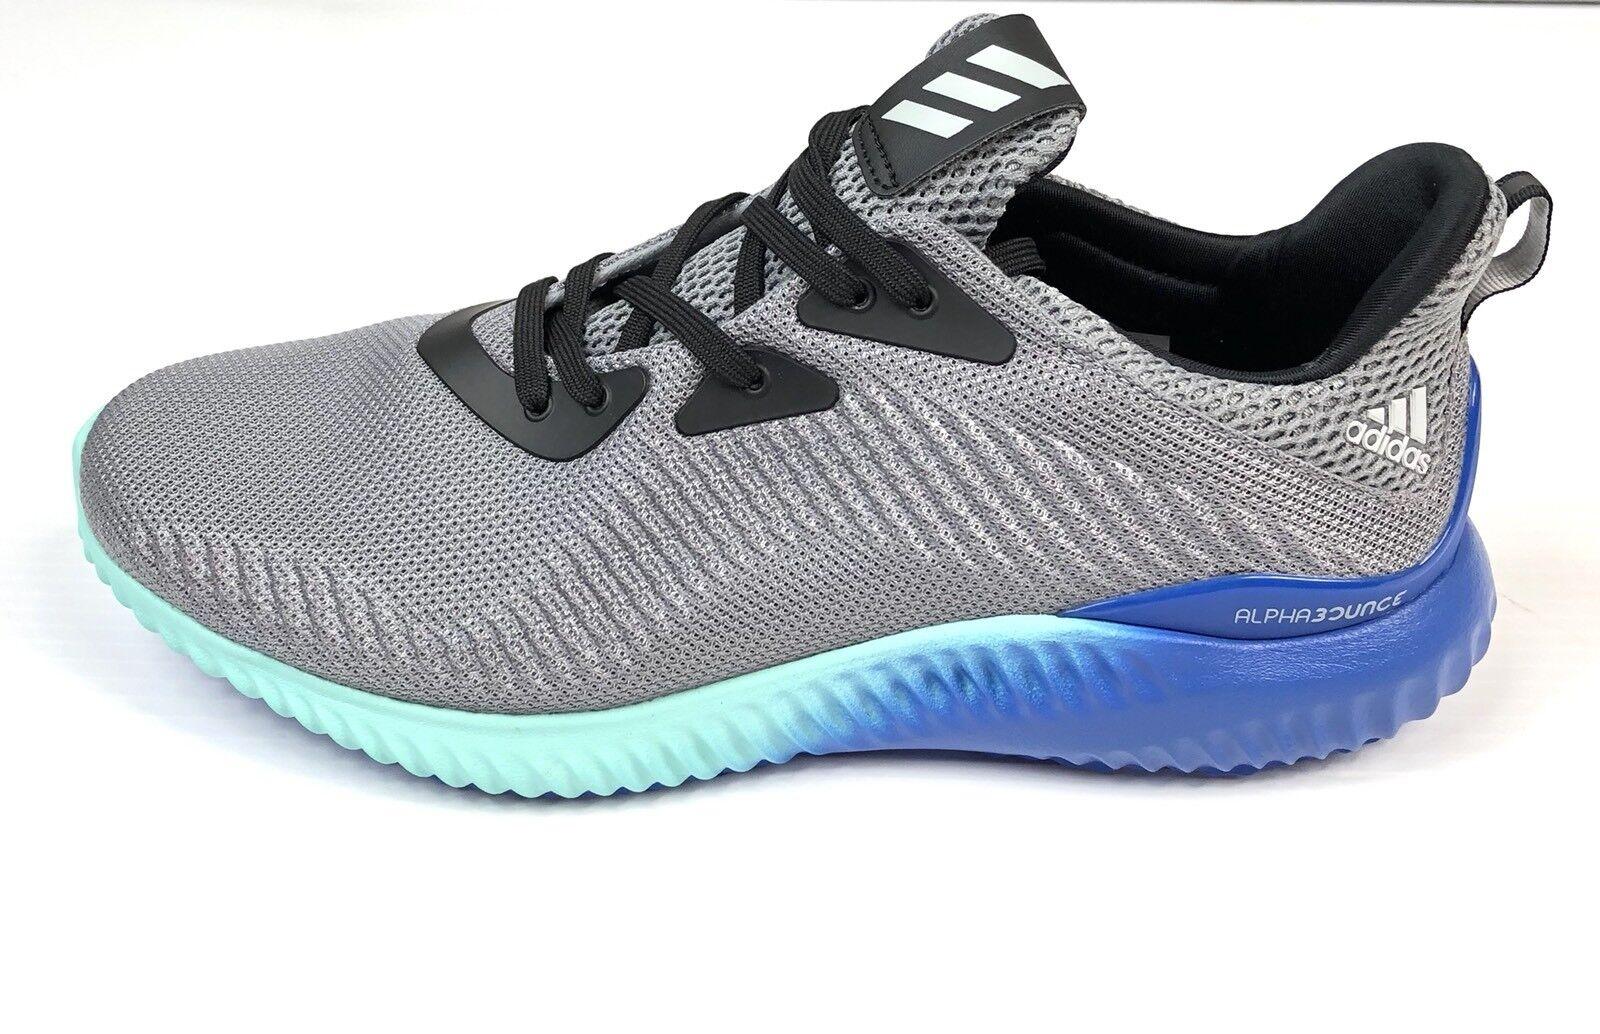 Adidas alphabounce scarpe 10 da corsa grey onyx aqua taglia 10 scarpe bb9035 nuova 5b2649